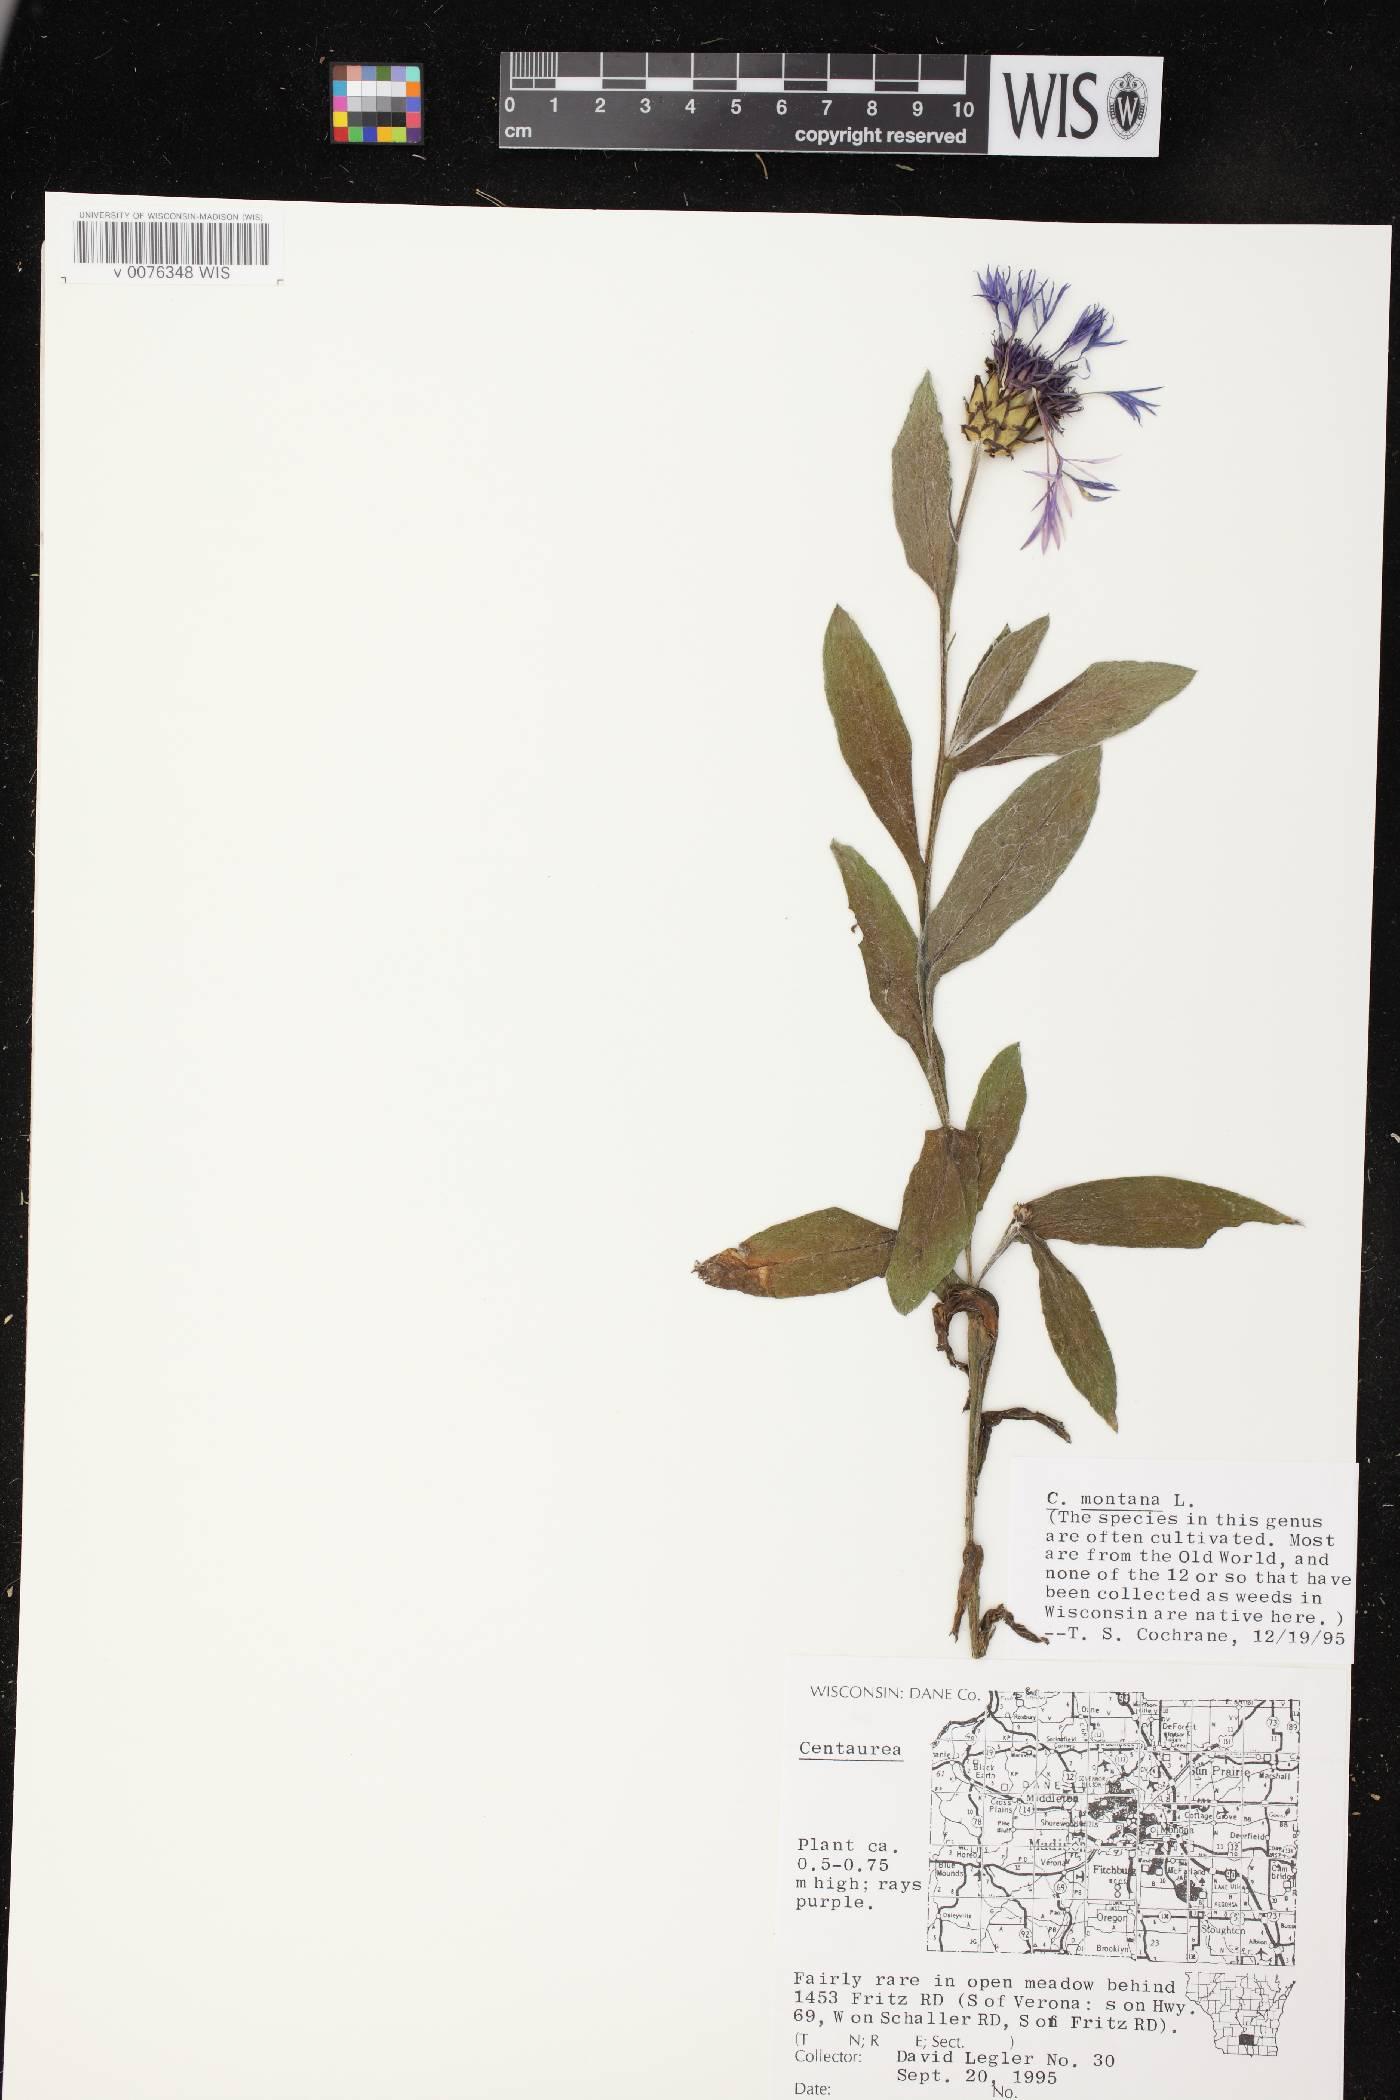 Centaurea montana image